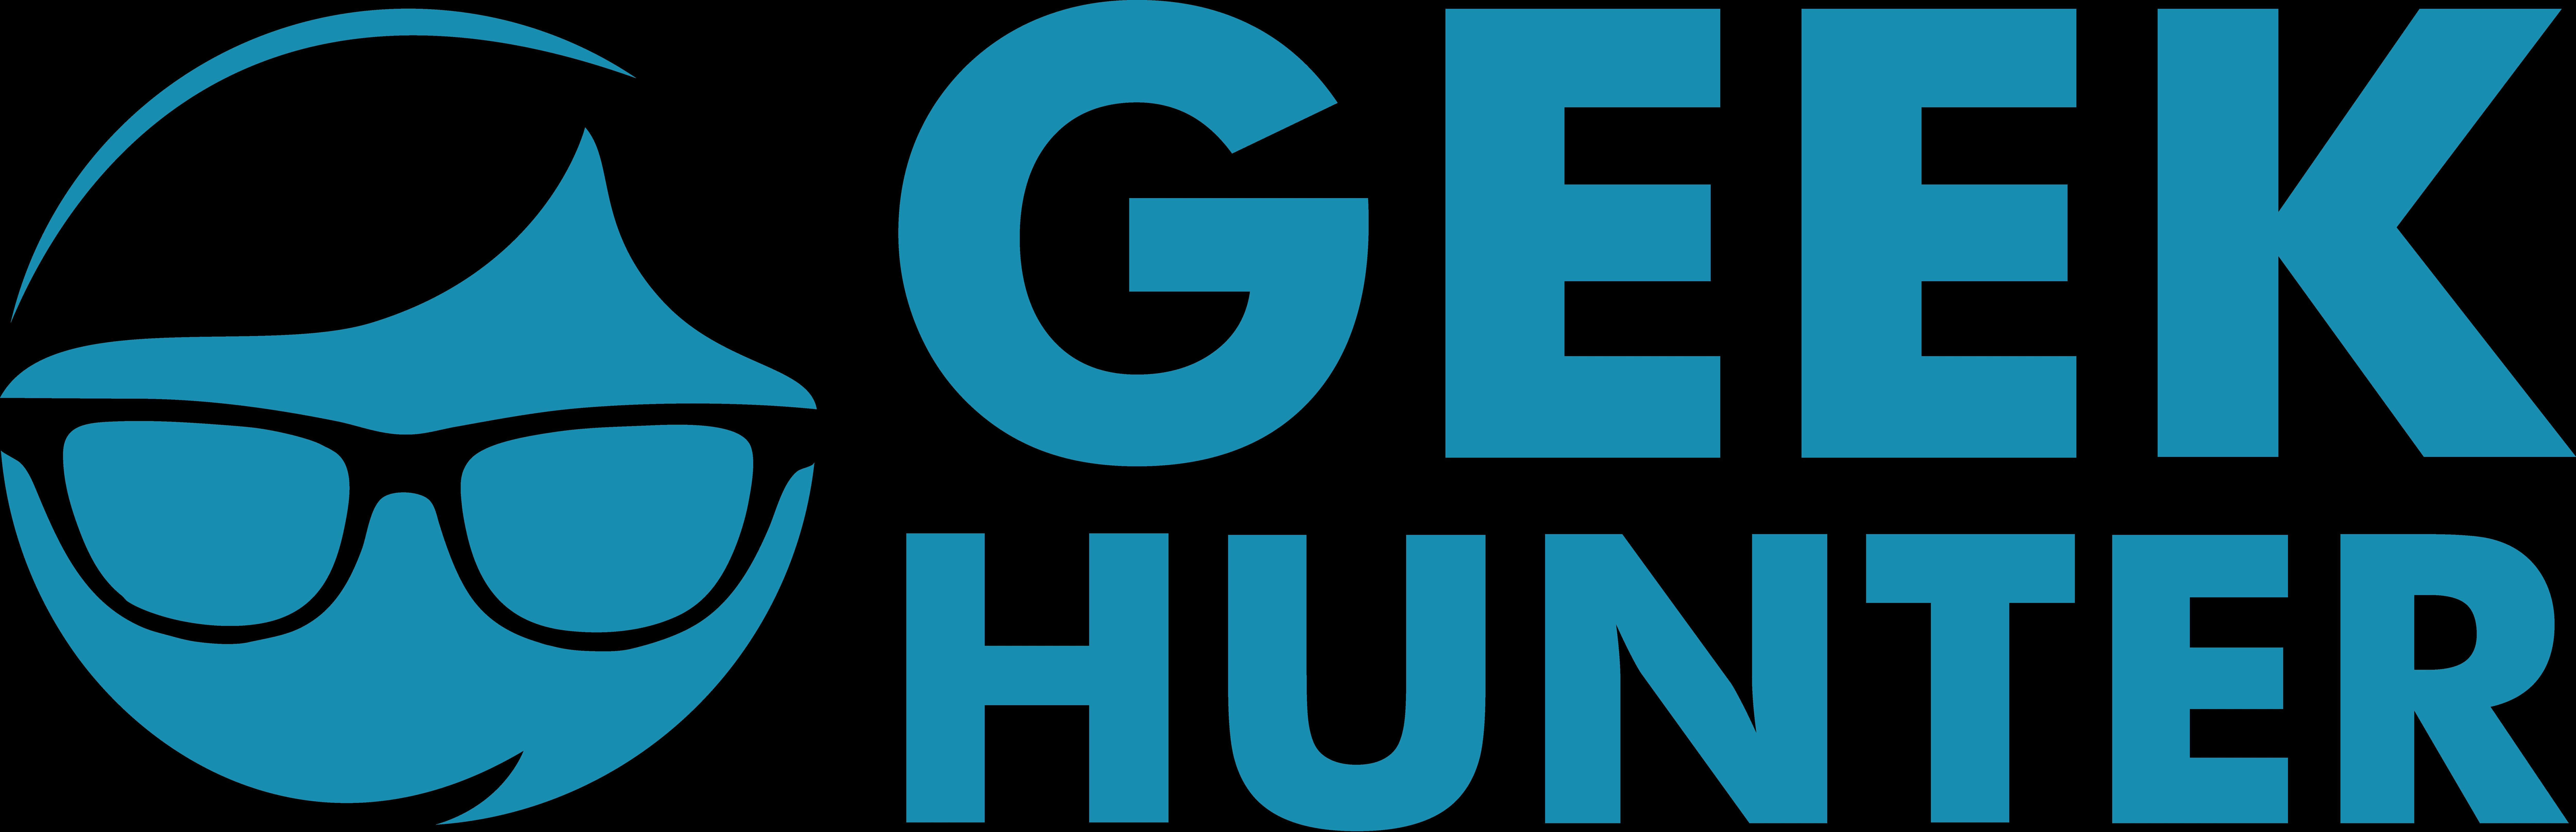 PT Geekhunter International's logo